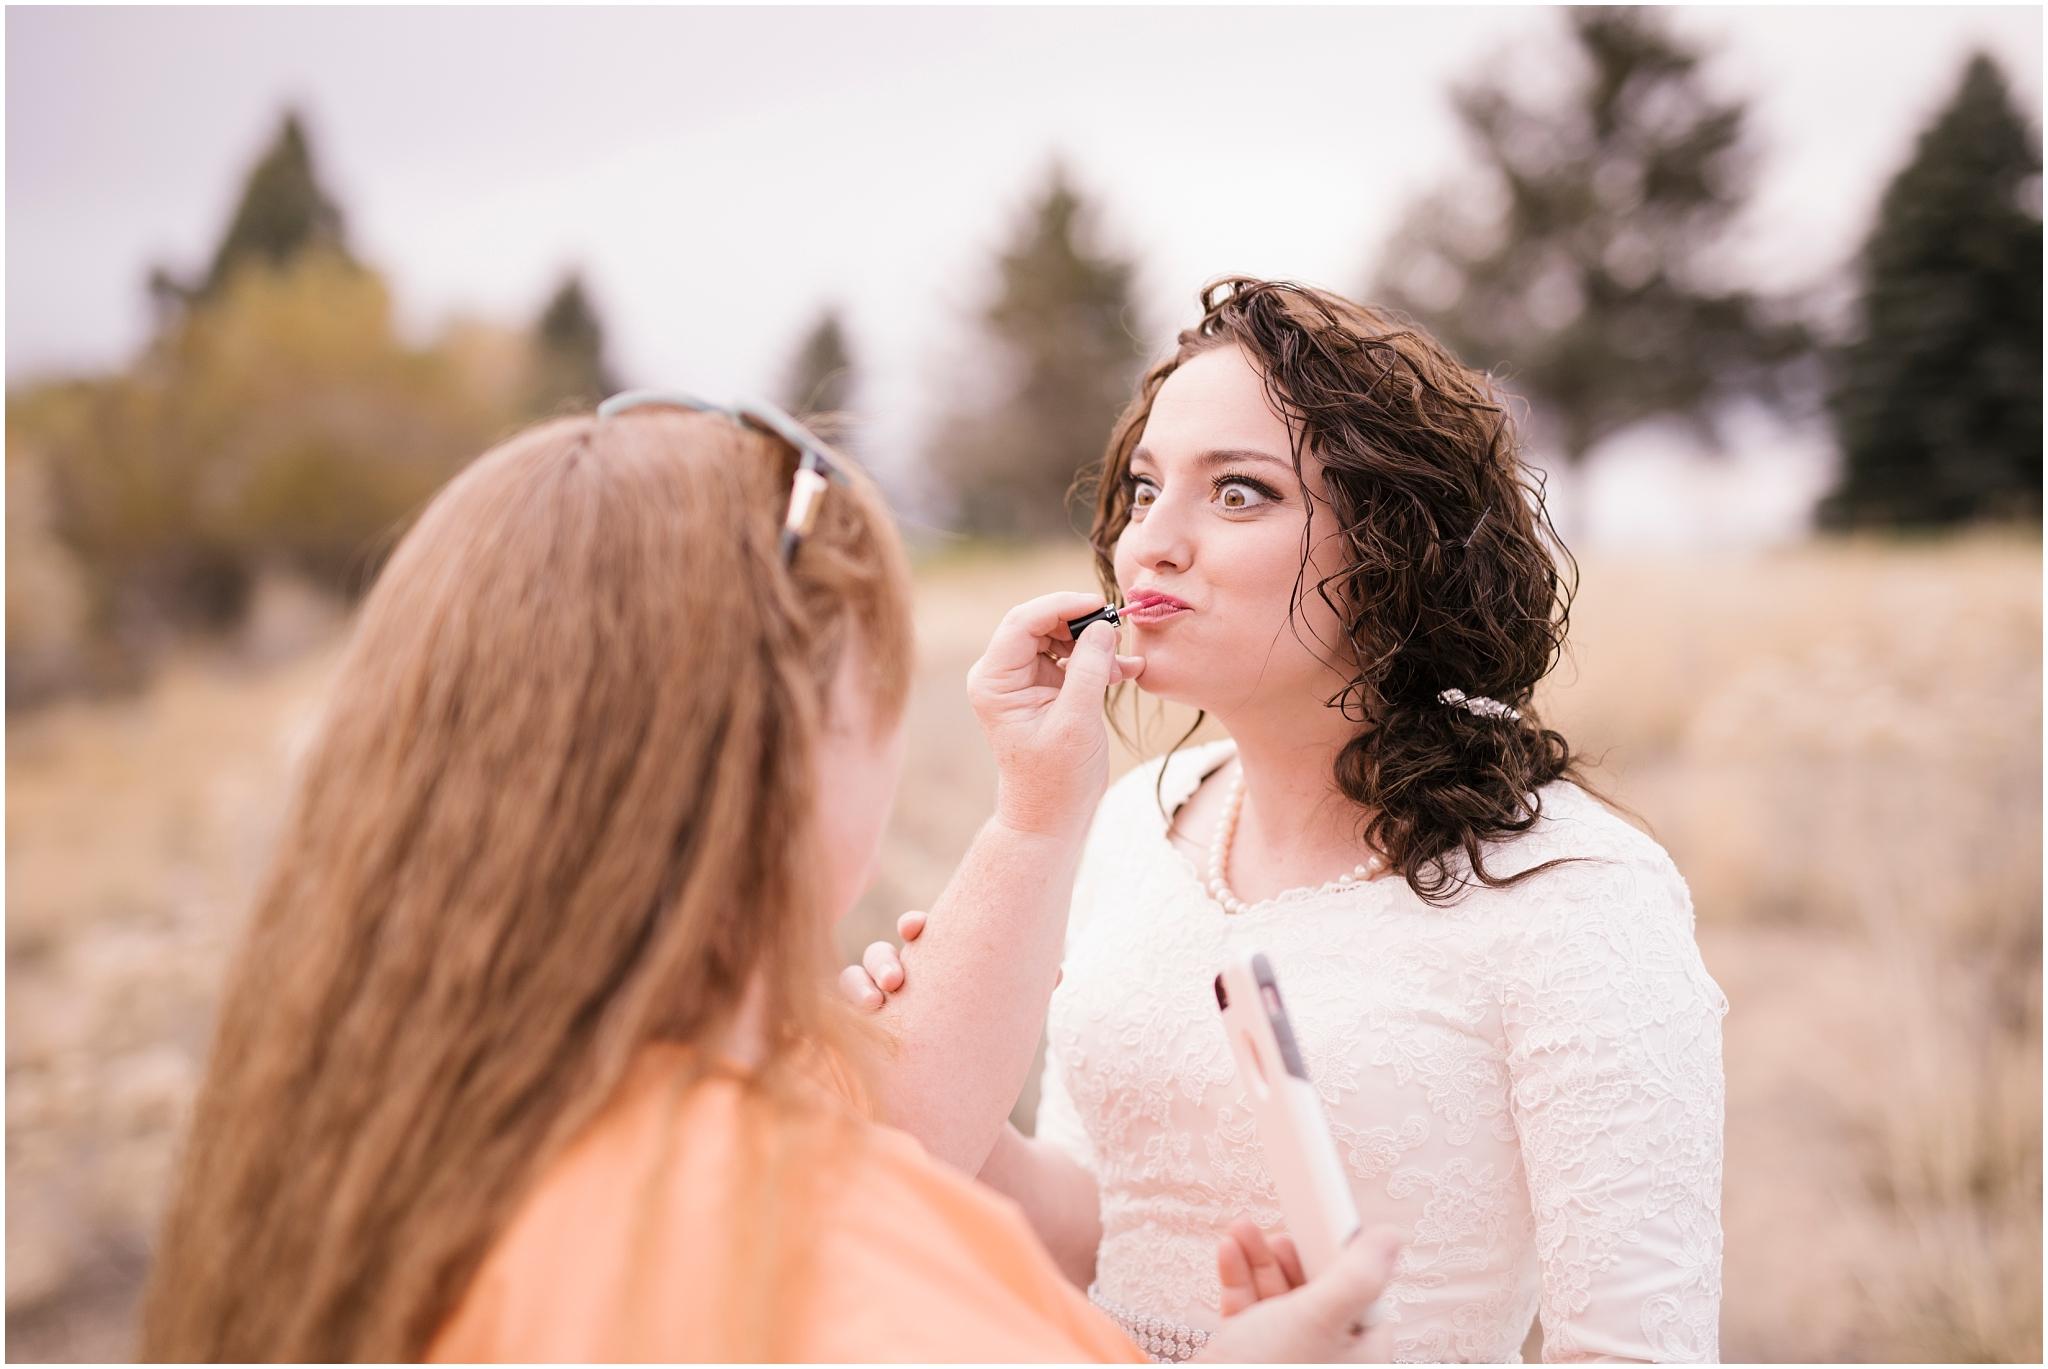 BA-Bridals-95_Lizzie-B-Imagery-Utah-Wedding-Photographer-Central-Utah-Photographer-Utah-County-Manti-Utah-Temple.jpg